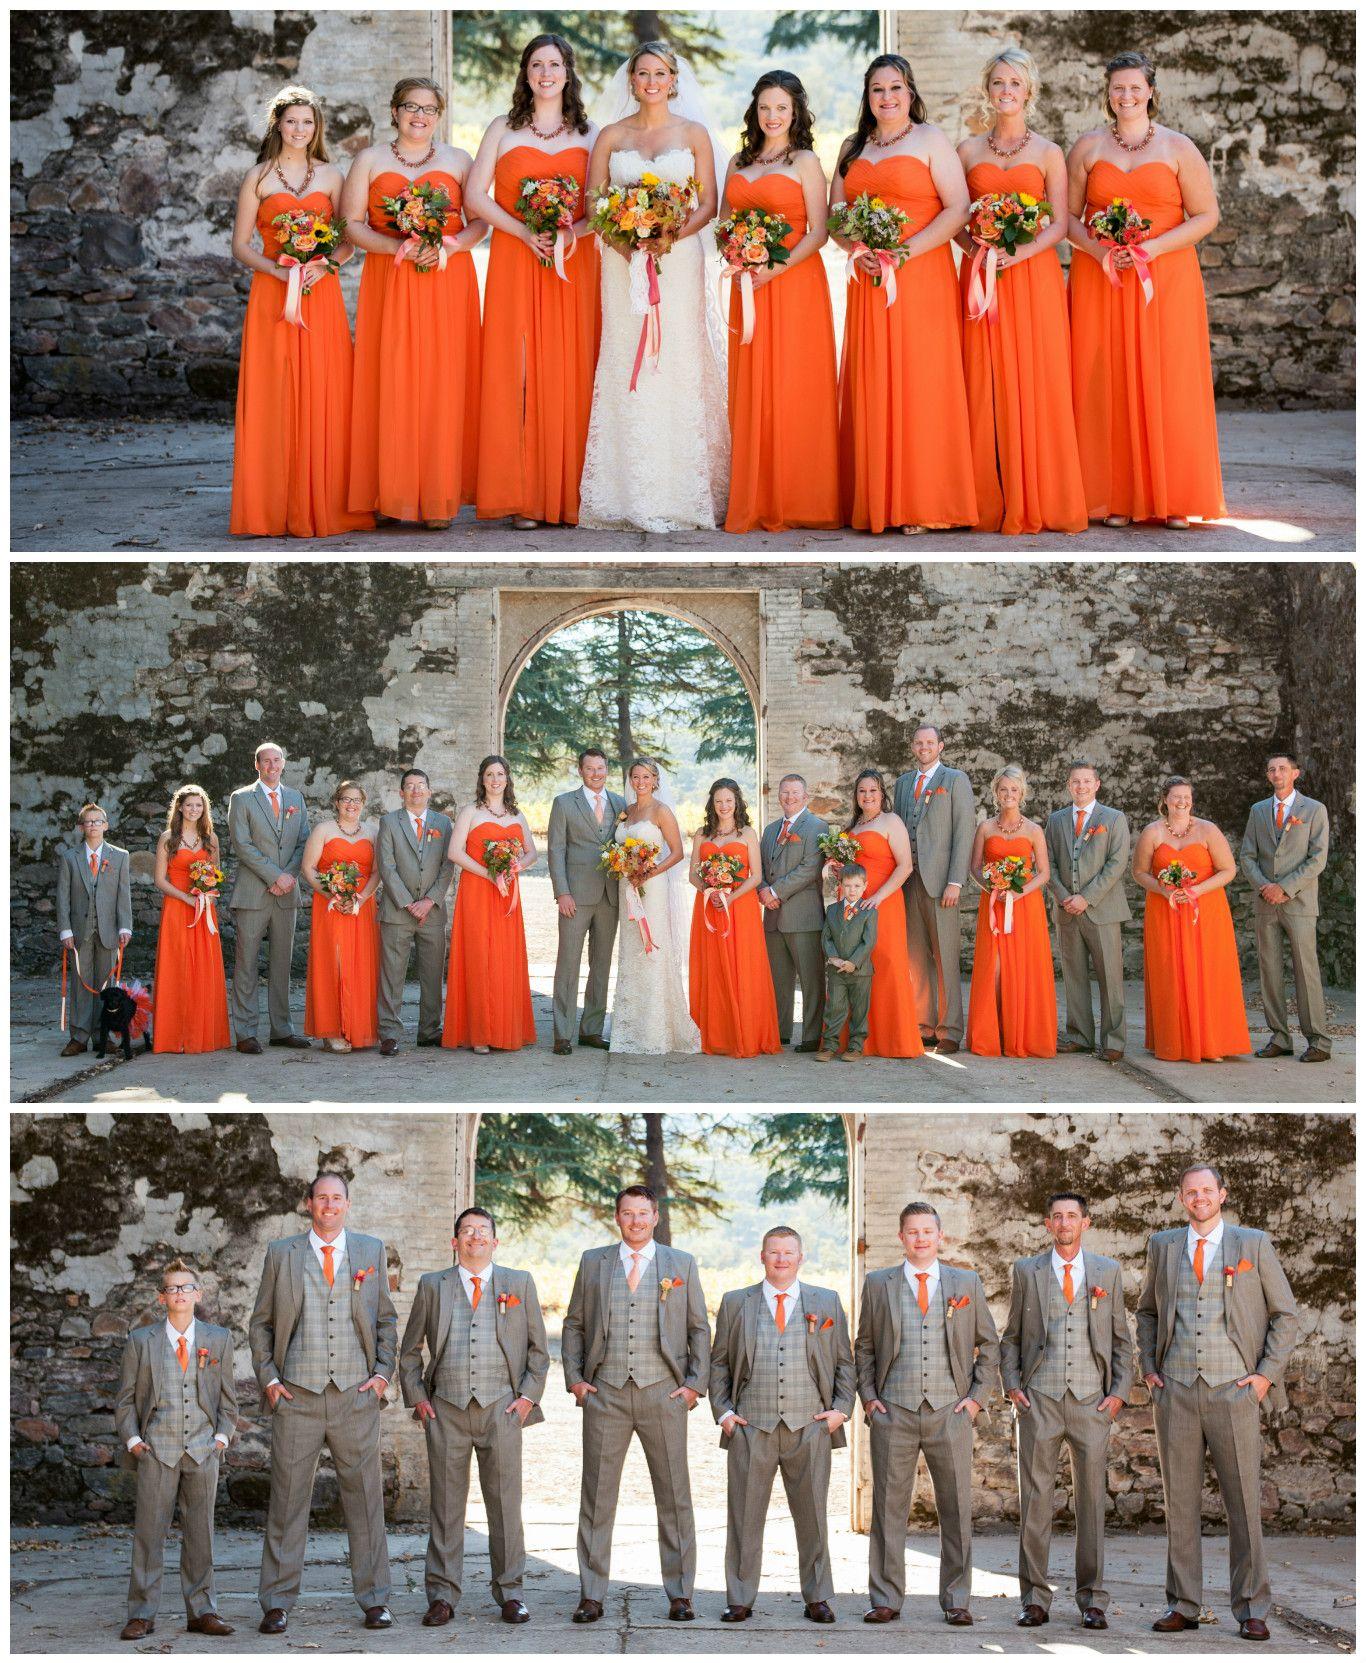 Orange bridesmaid dresses and gray groomsmen suits first look orange bridesmaid dresses and gray groomsmen suits first look pictures were taken in the wine ombrellifo Choice Image